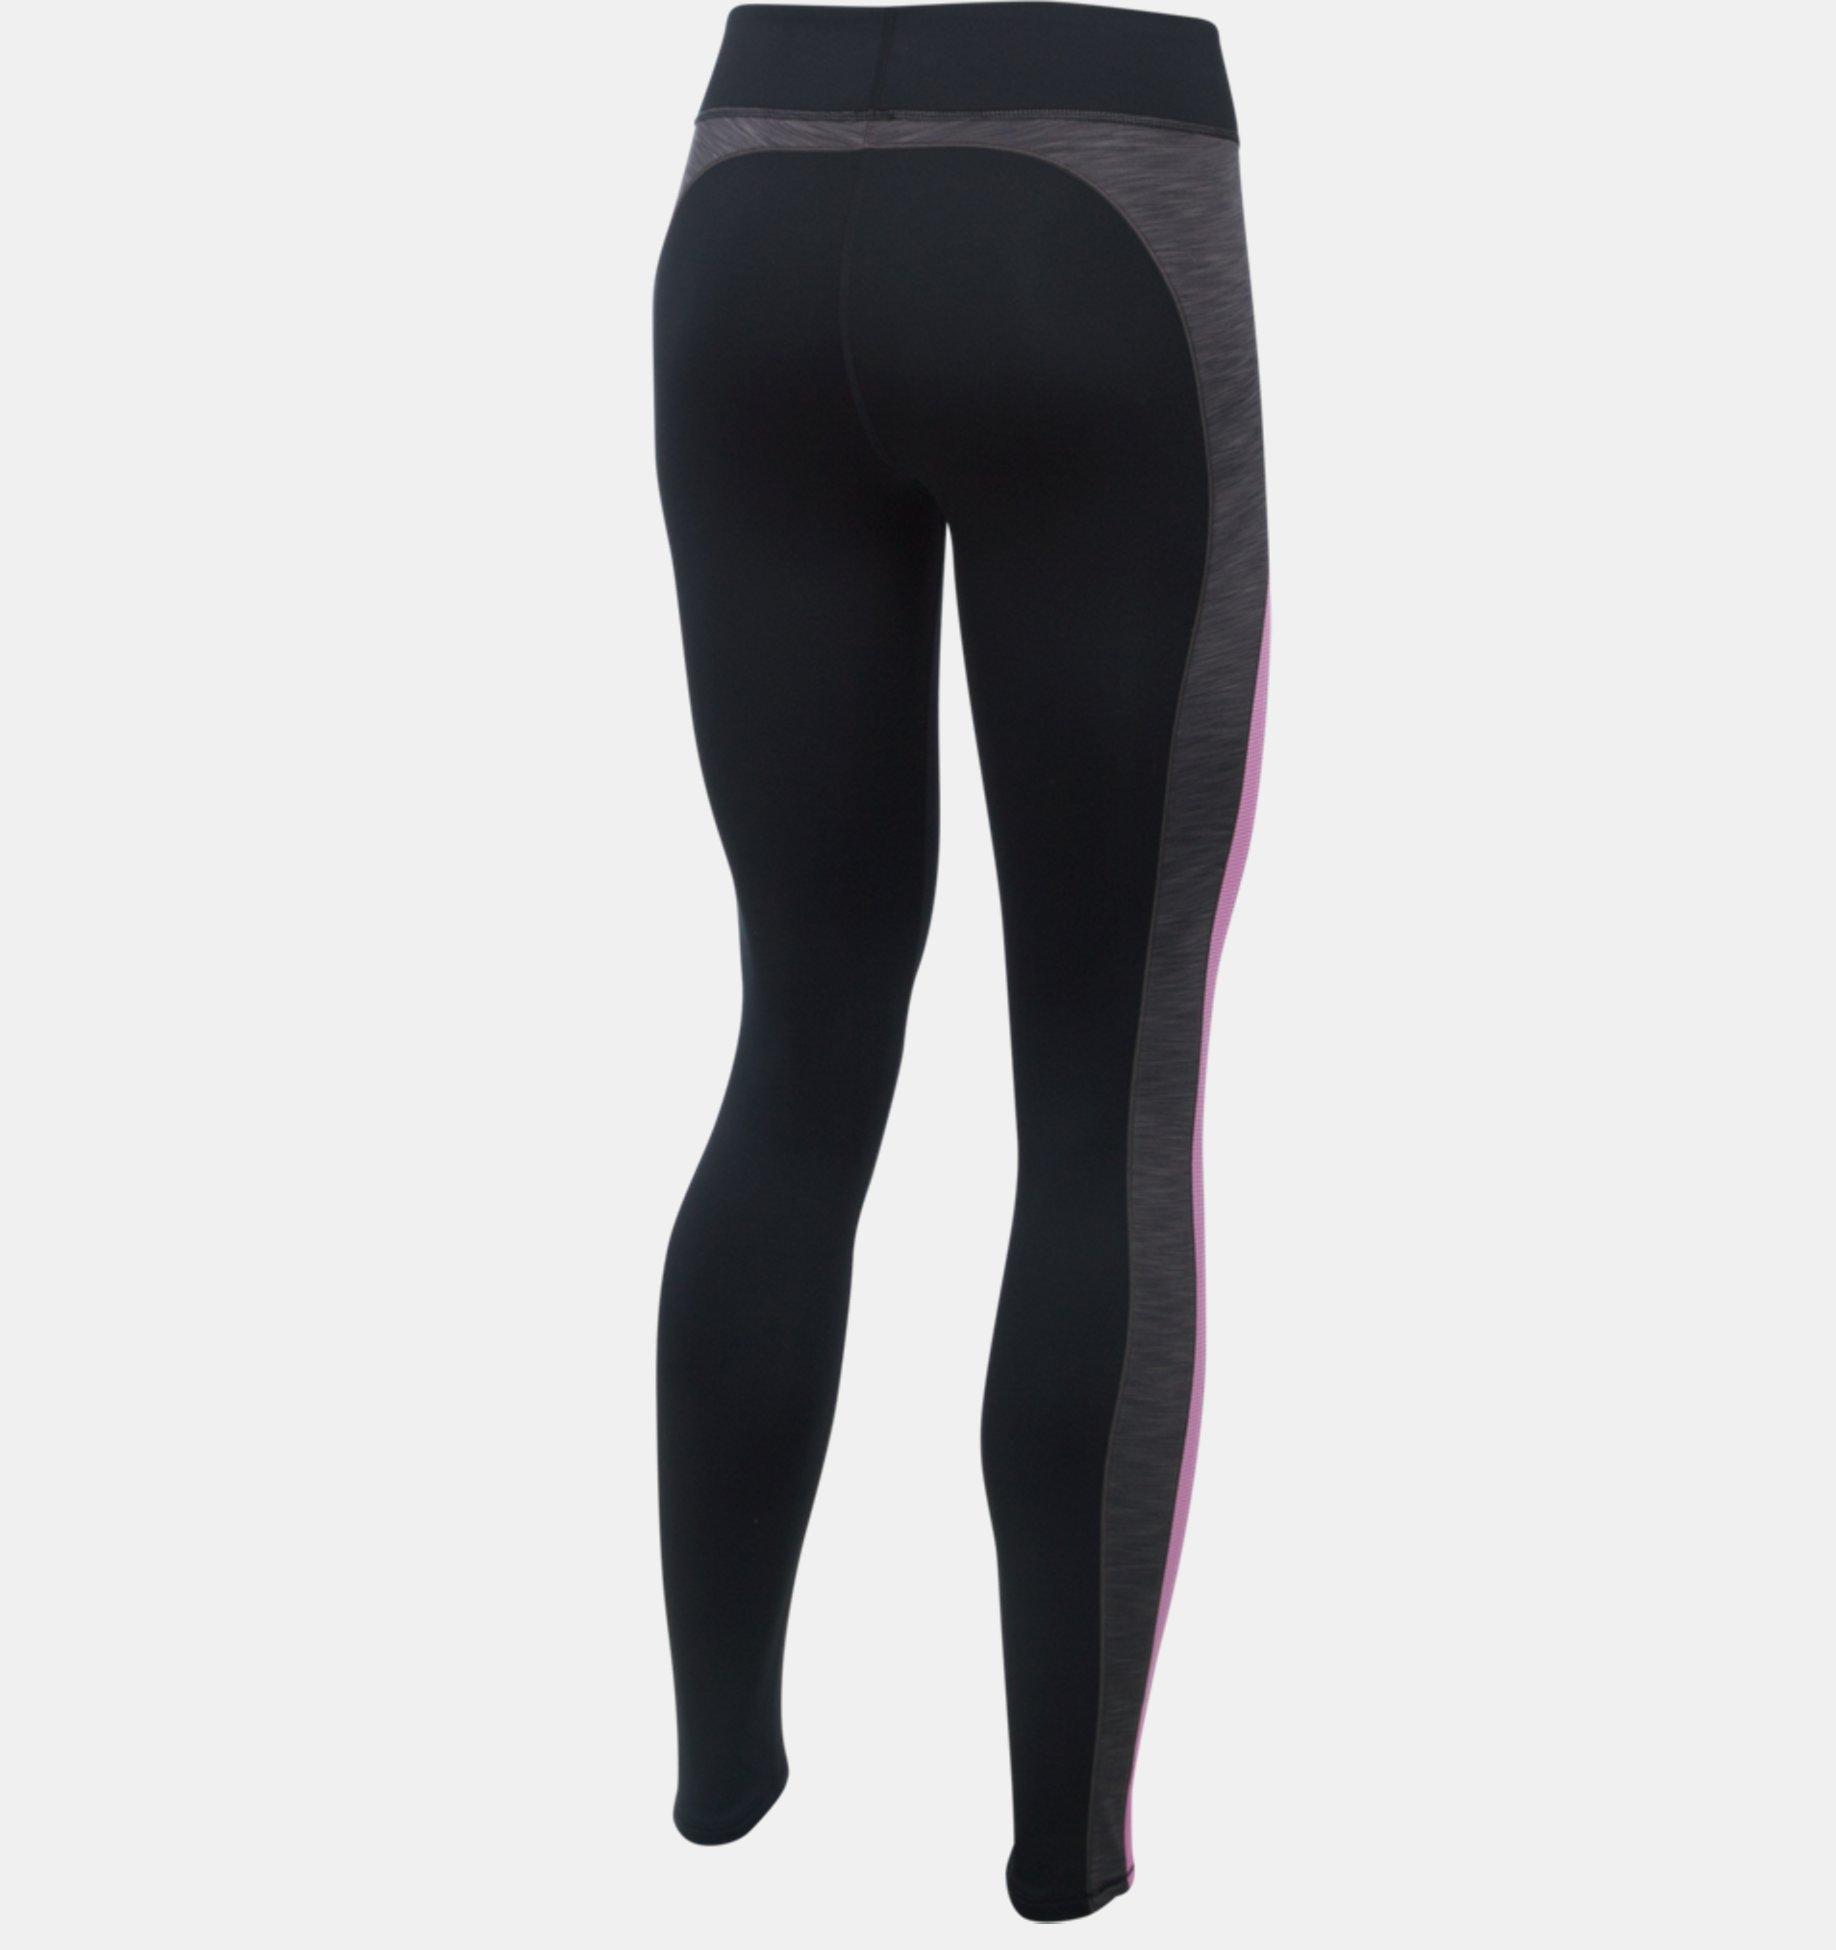 2ea7a6e11e9d40 Women's UA ColdGear® Legging   Under Armour IE